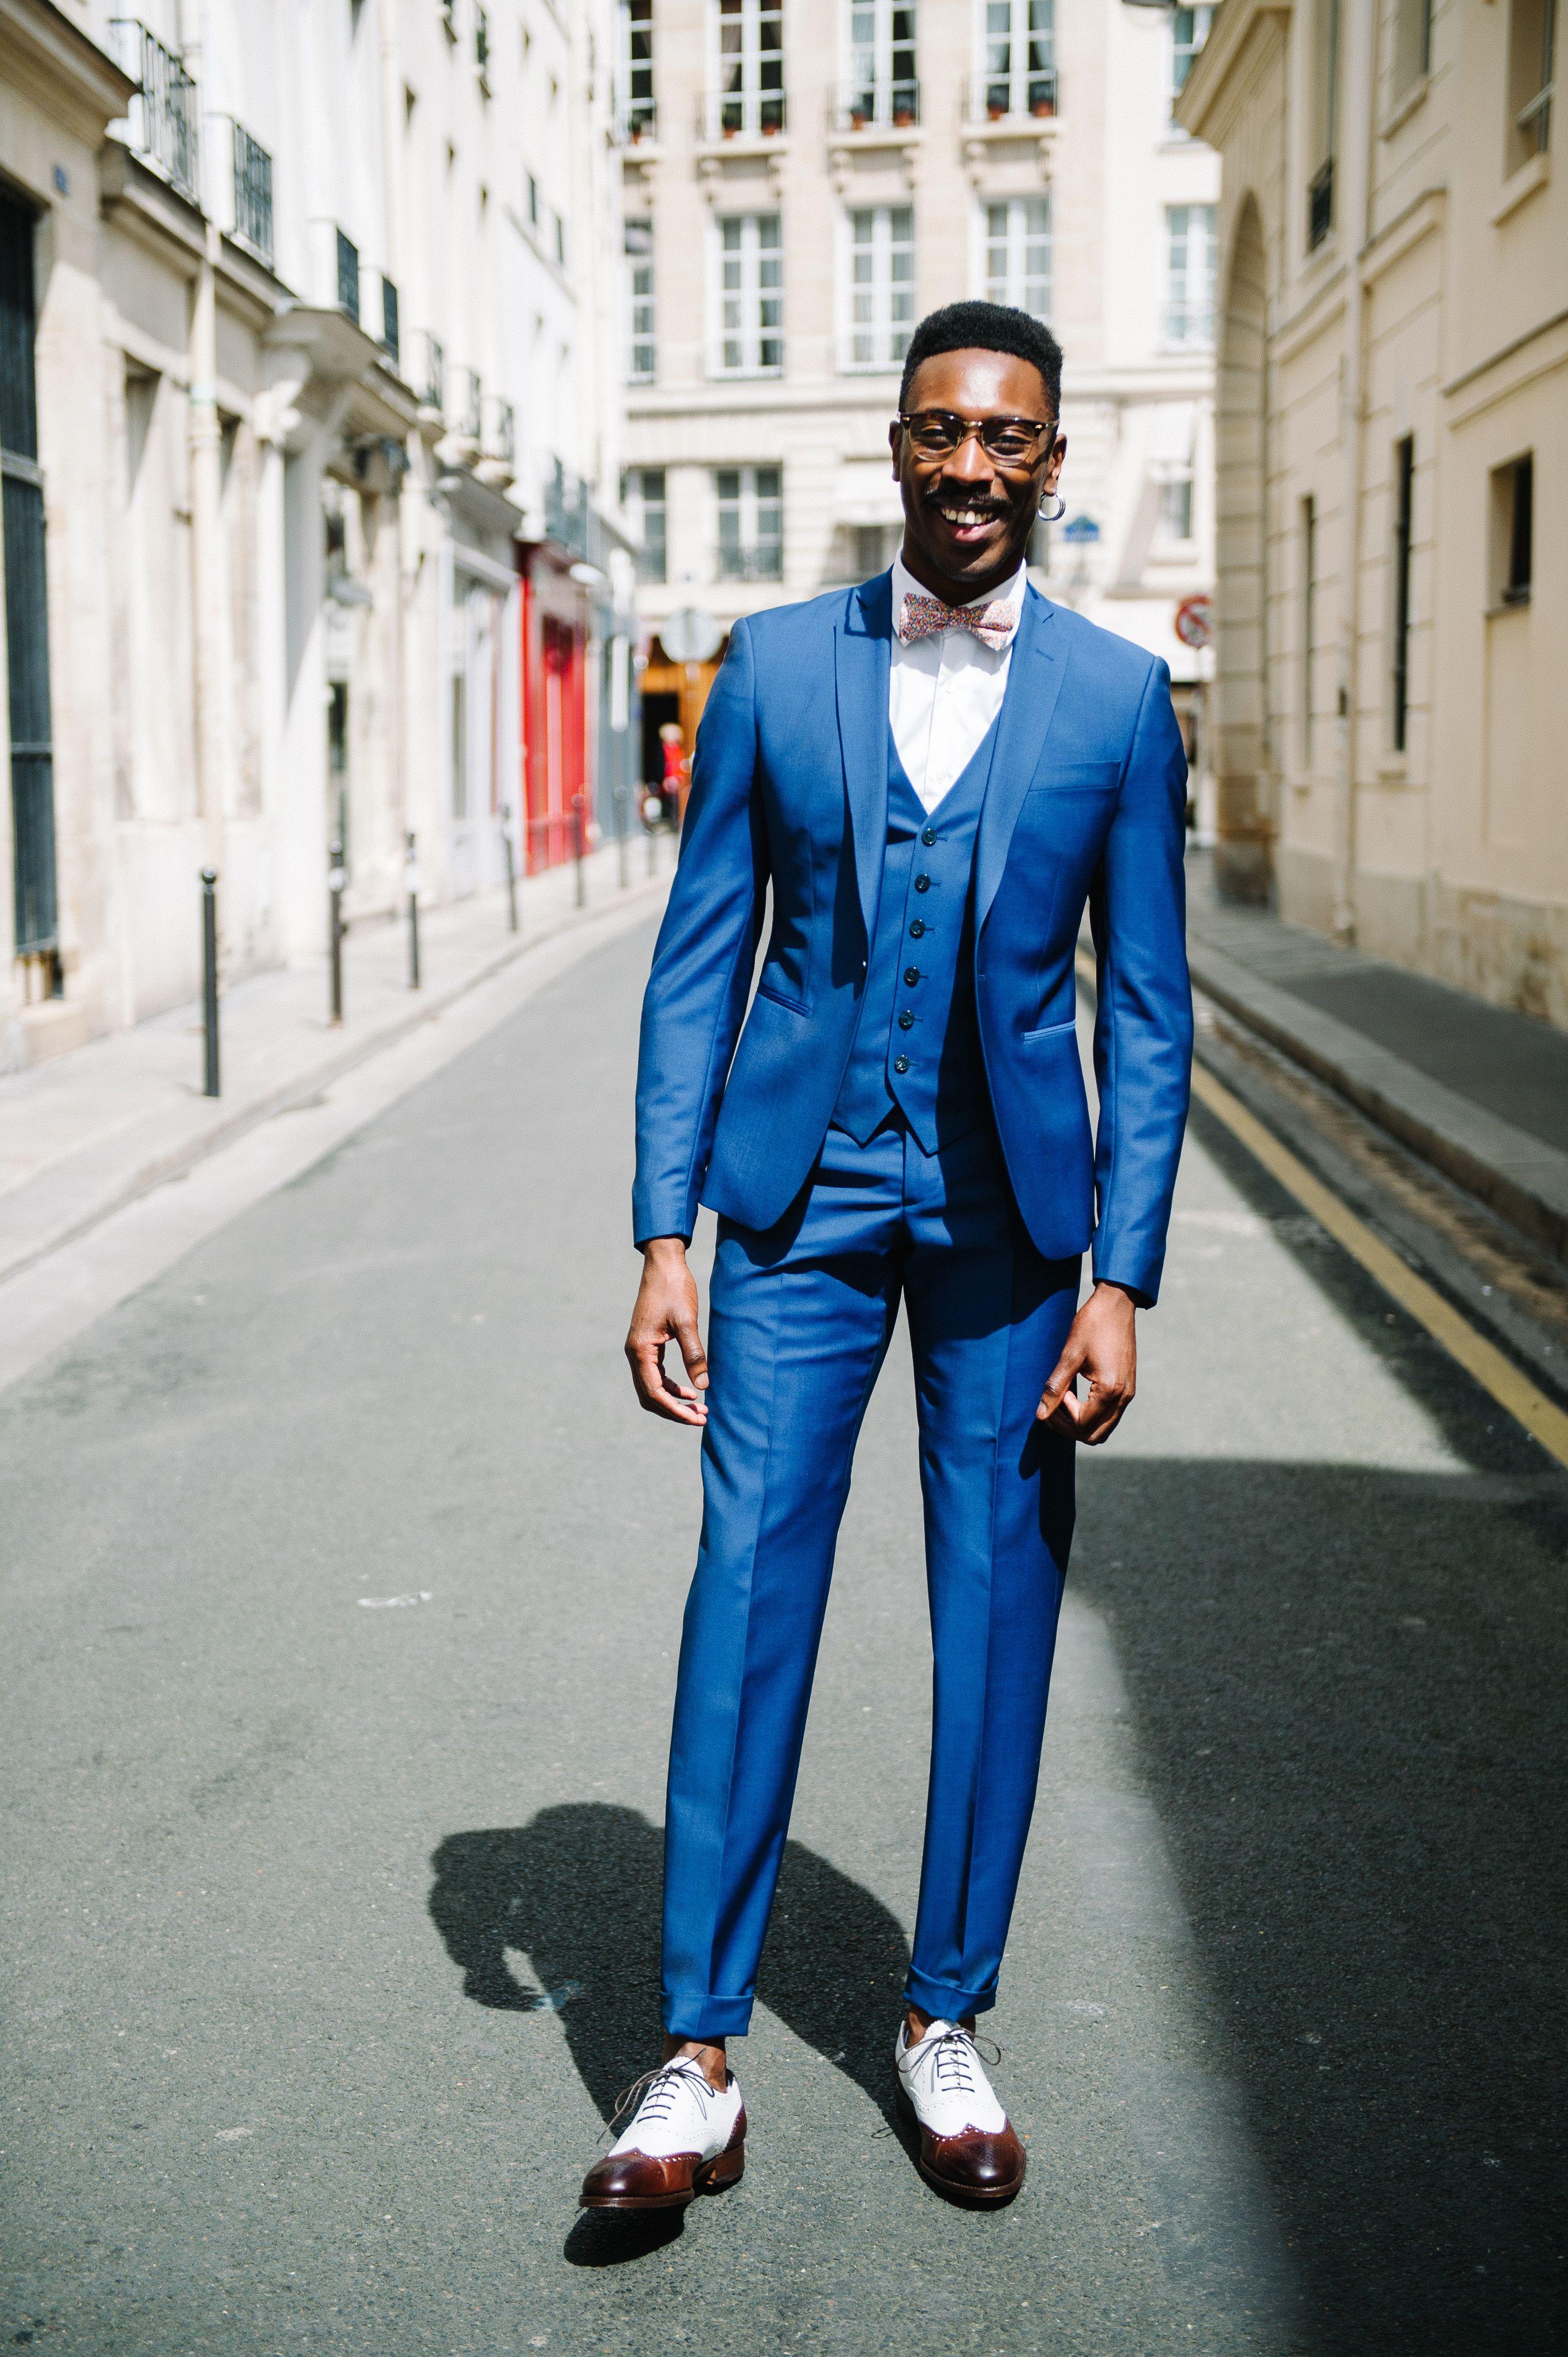 Très look costume bleu mariage homme | Costume mariage | Pinterest PY26